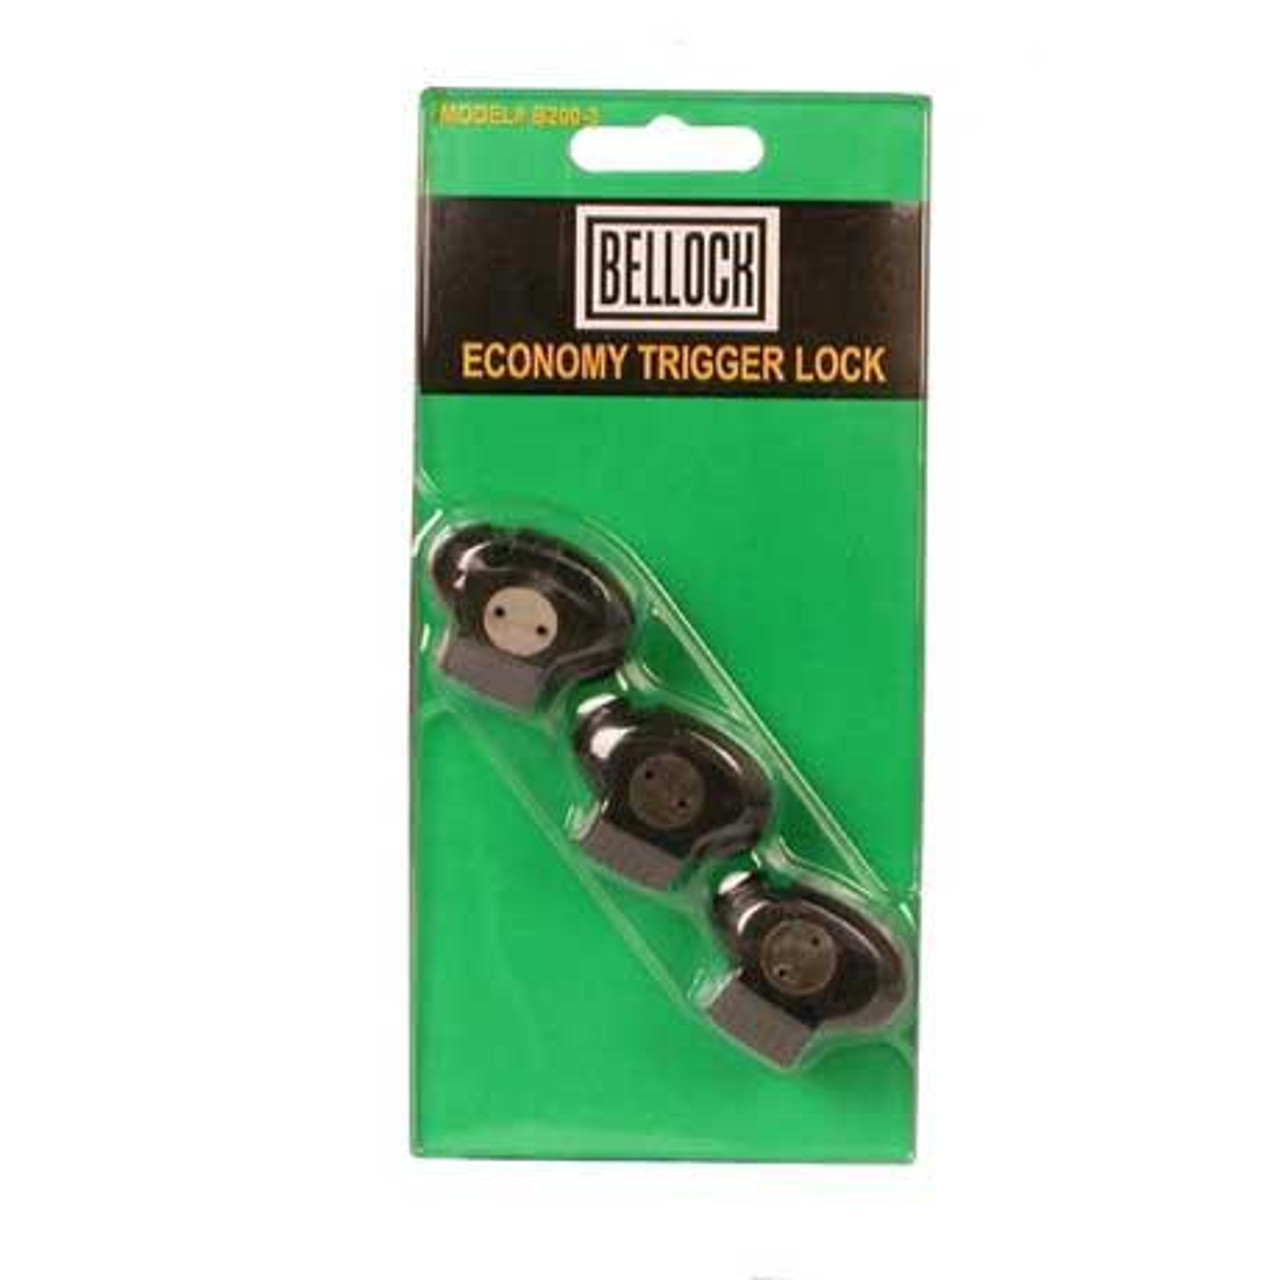 Economy Trigger Lock - 3 Pack